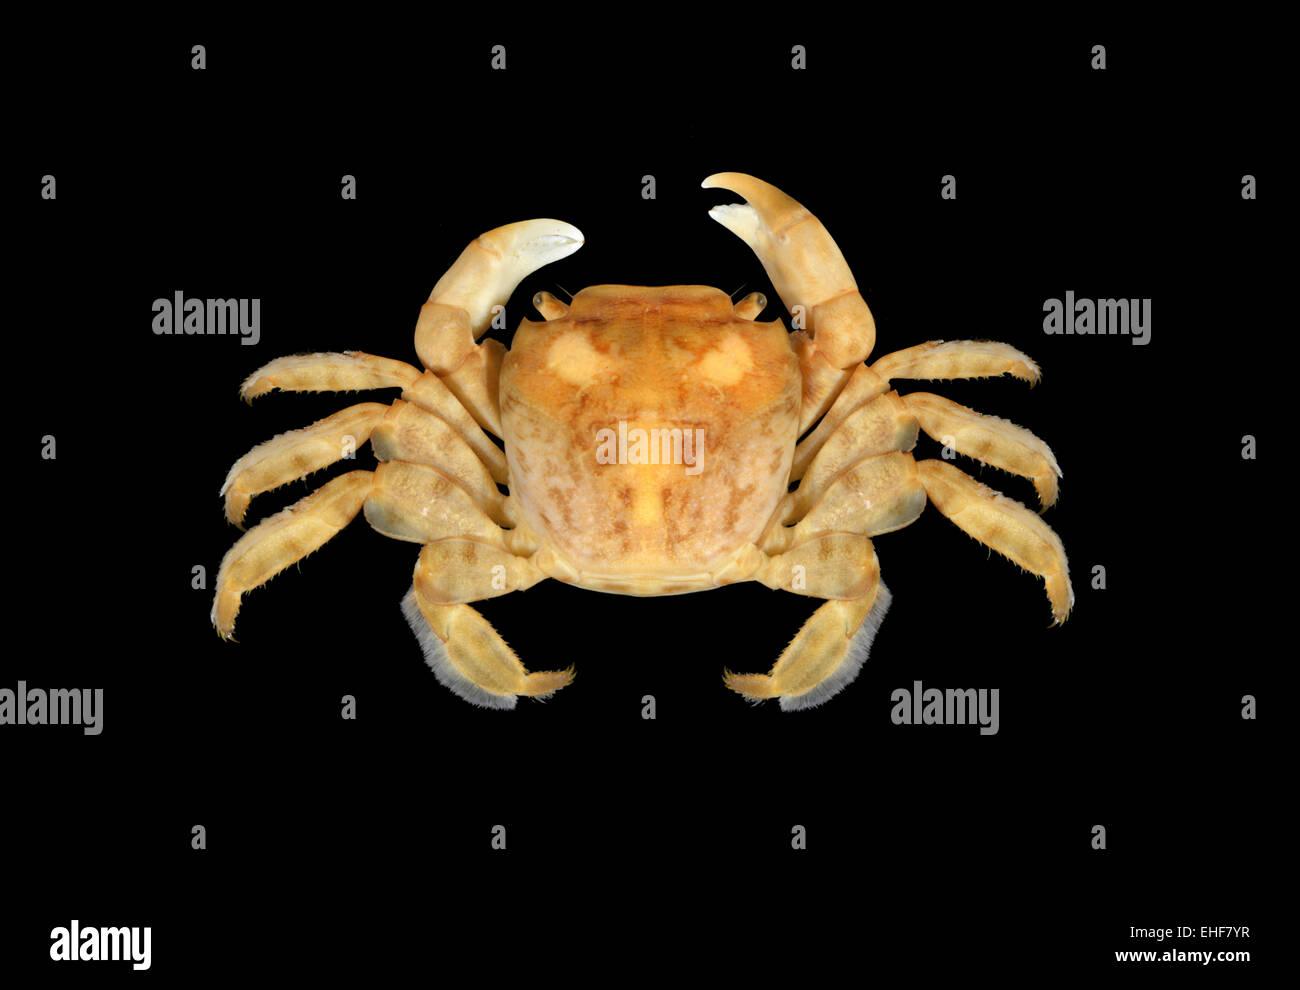 Columbus Crab - Planes minutus - Stock Image